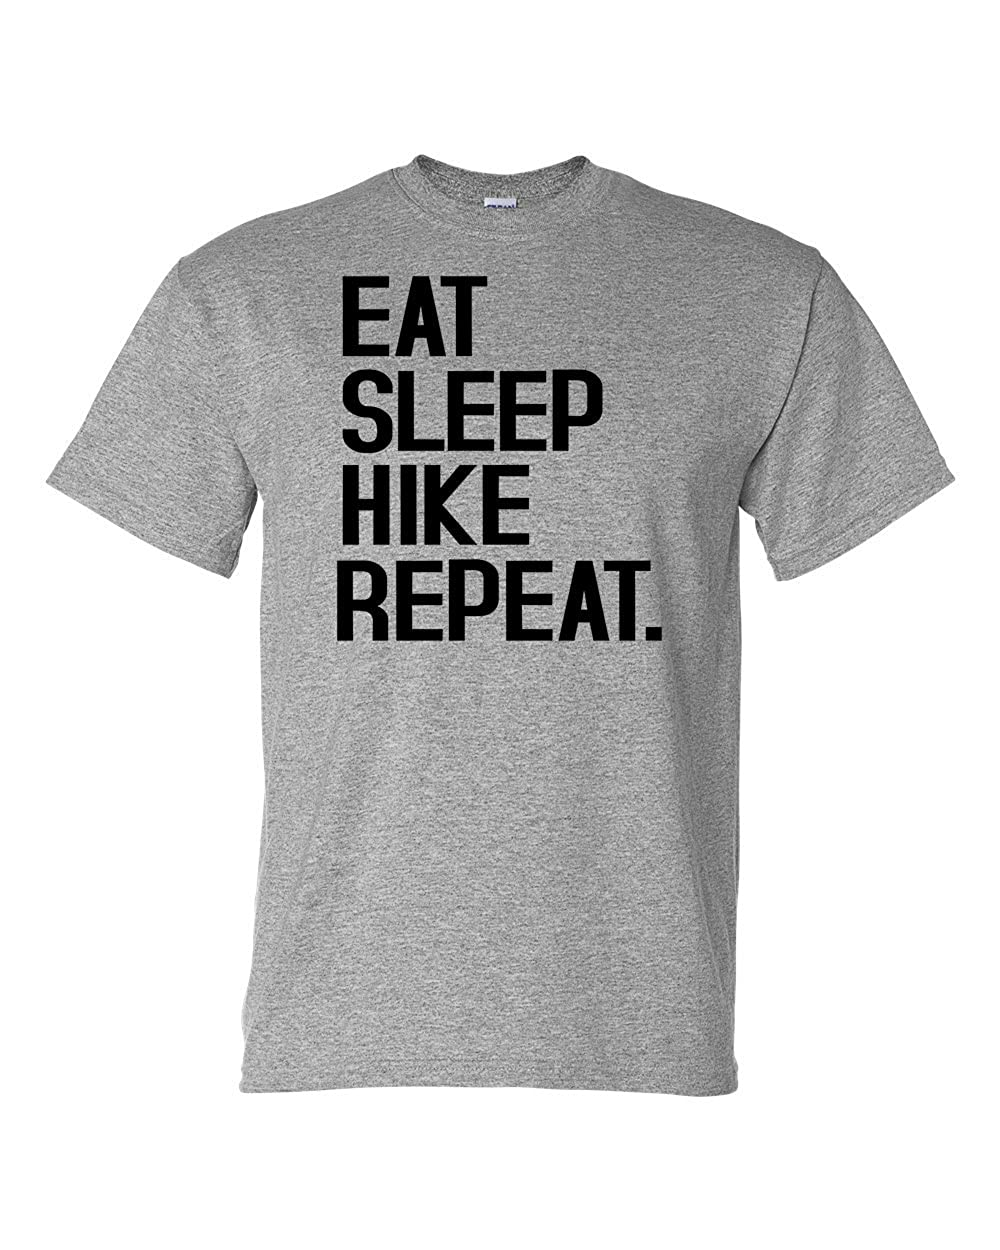 Custom Apparel R Us Eat Sleep Hike Repeat Mens Short Sleeve